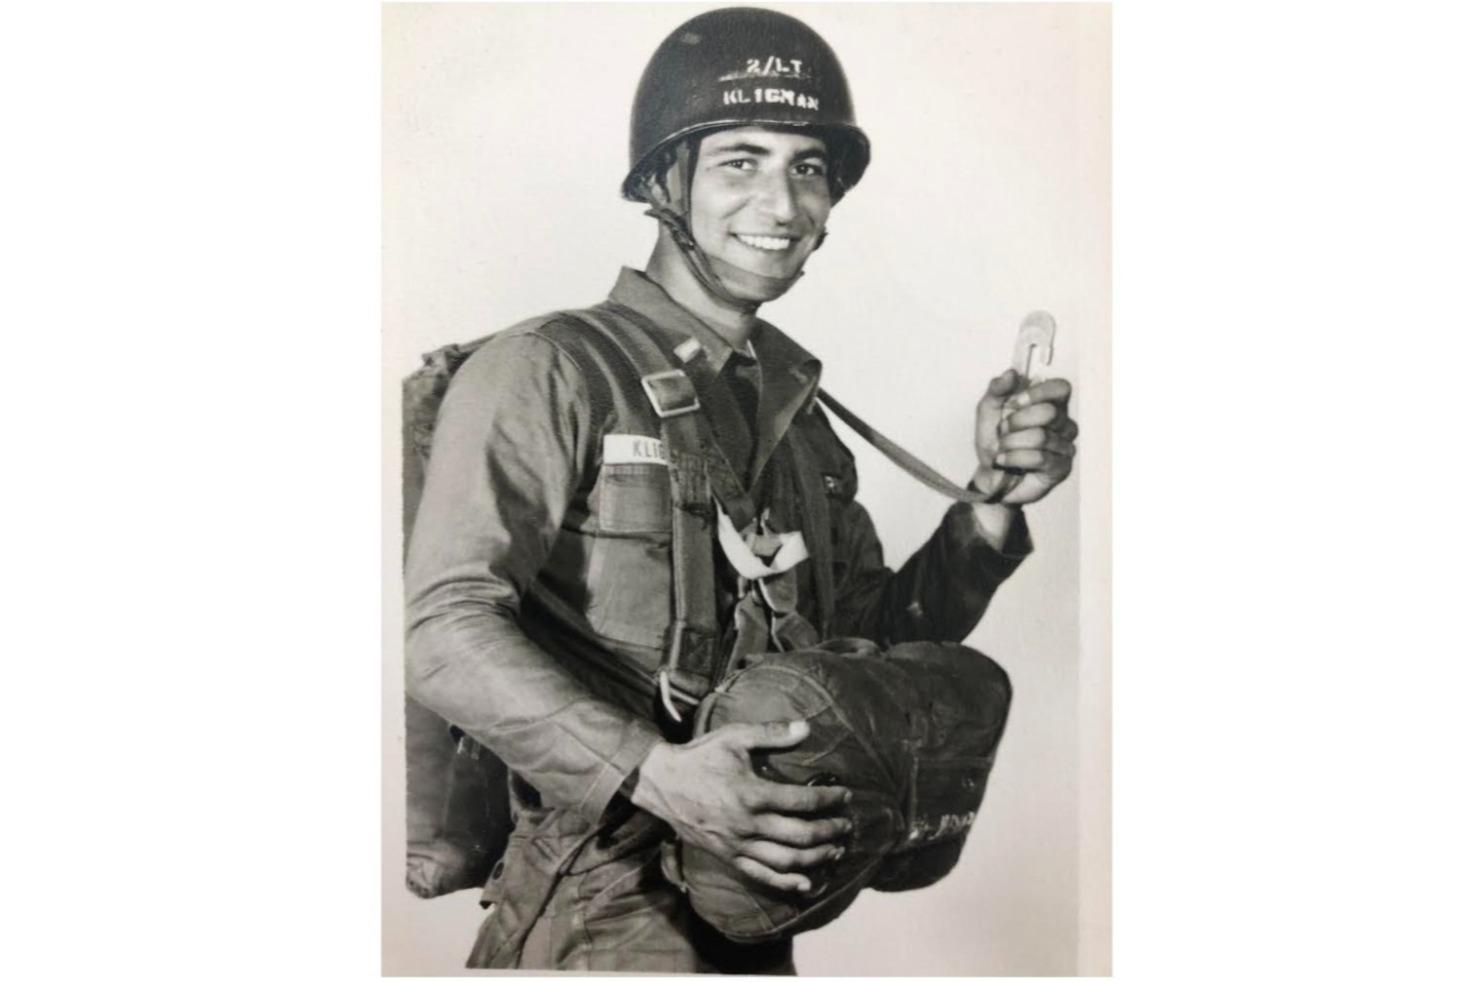 Harris L. Kligman retired United States Army Intelligence Officer